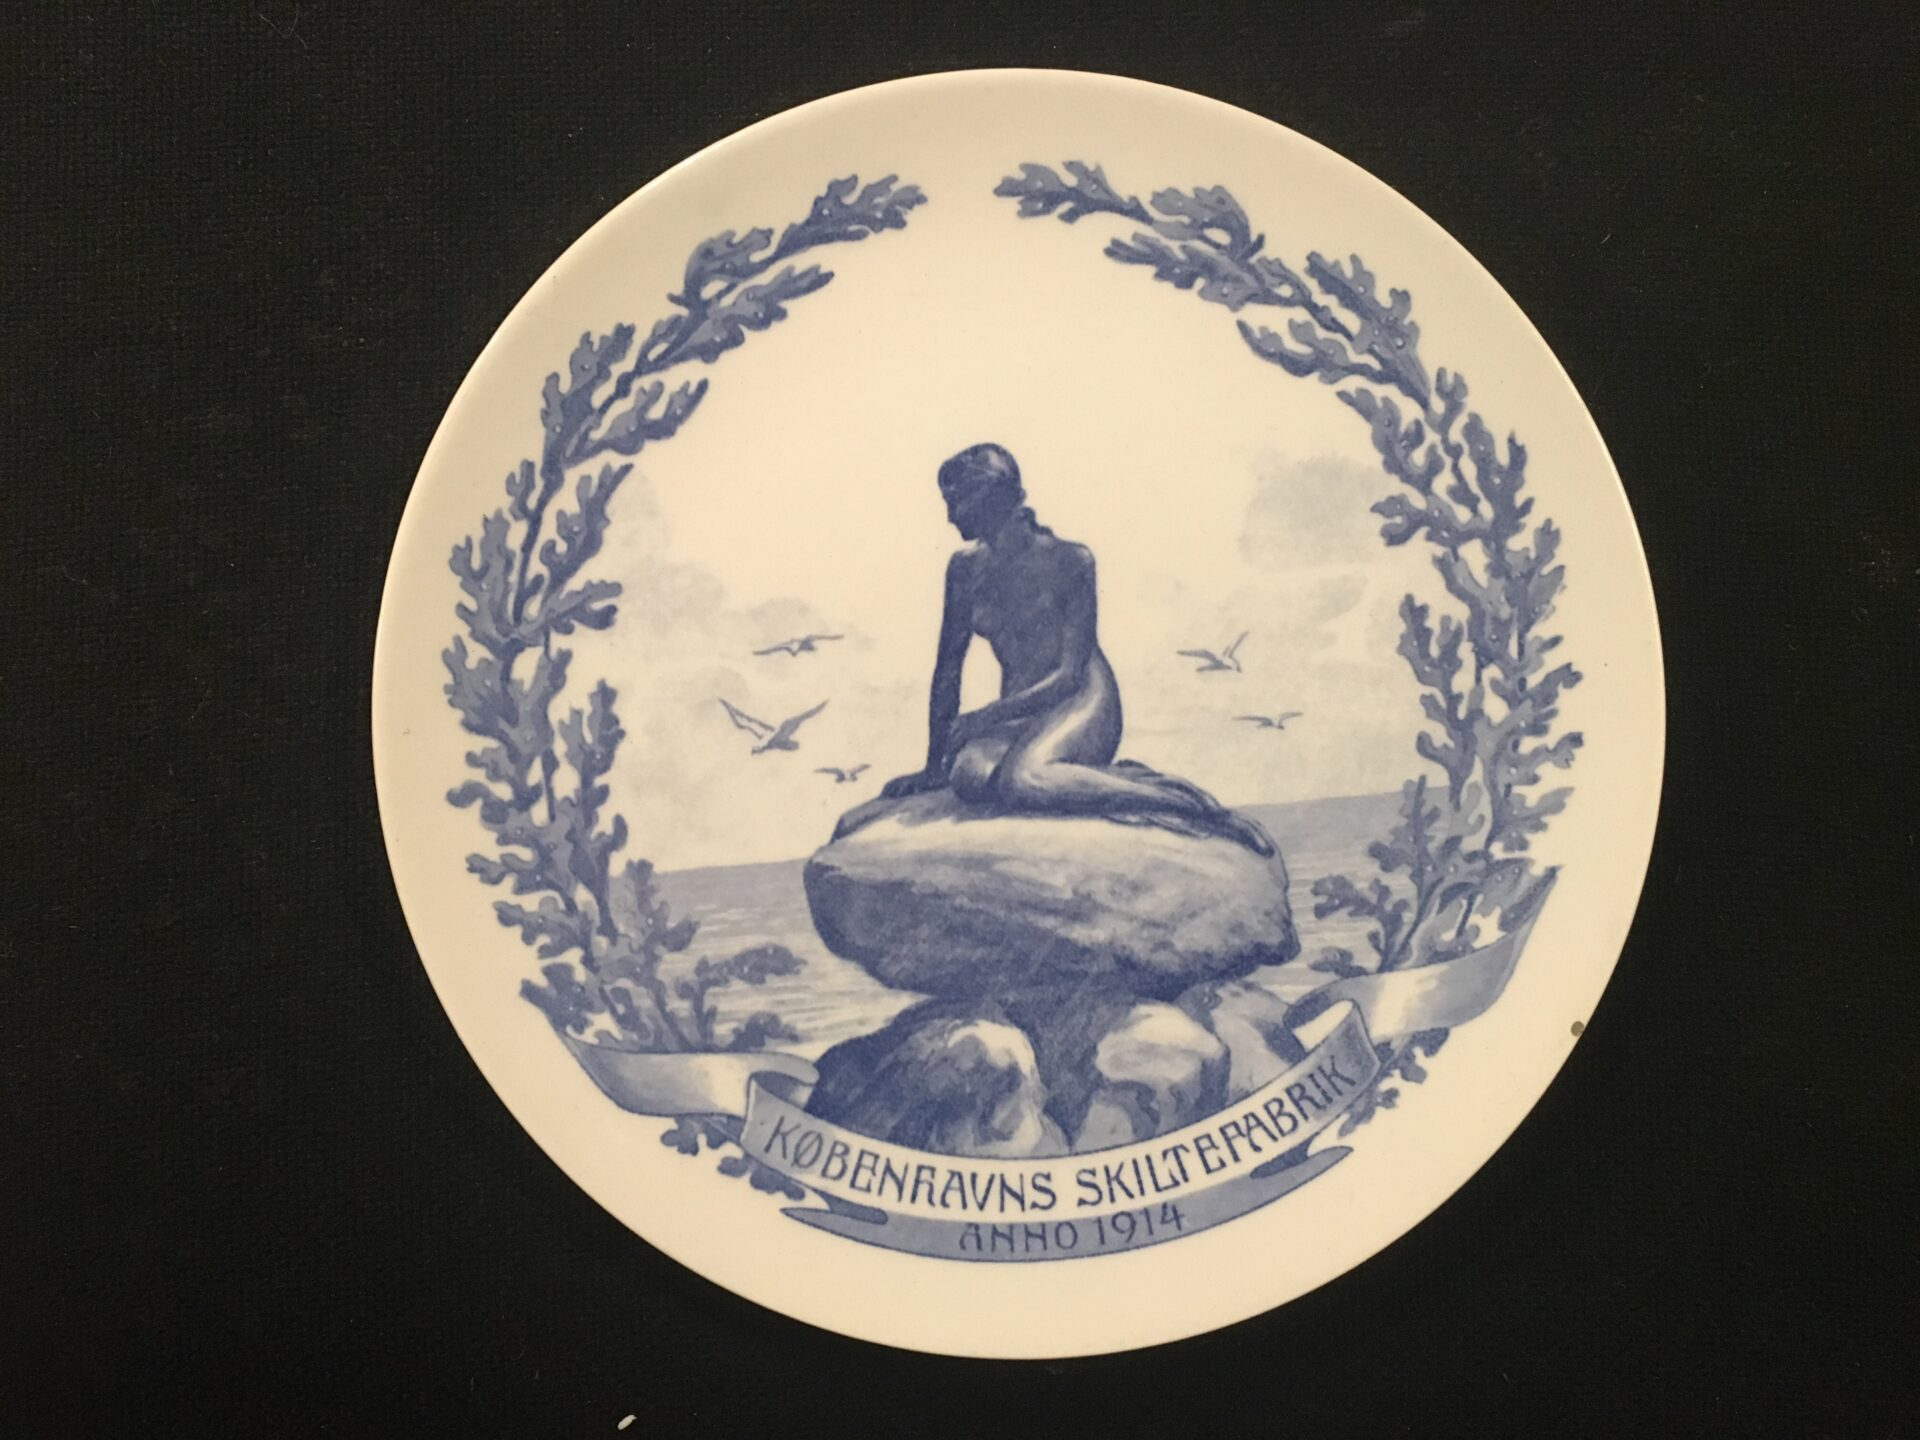 Københavns Skiltefabrik 1904, Aluminia fajance platte, d=21 cm., pris 200 kr